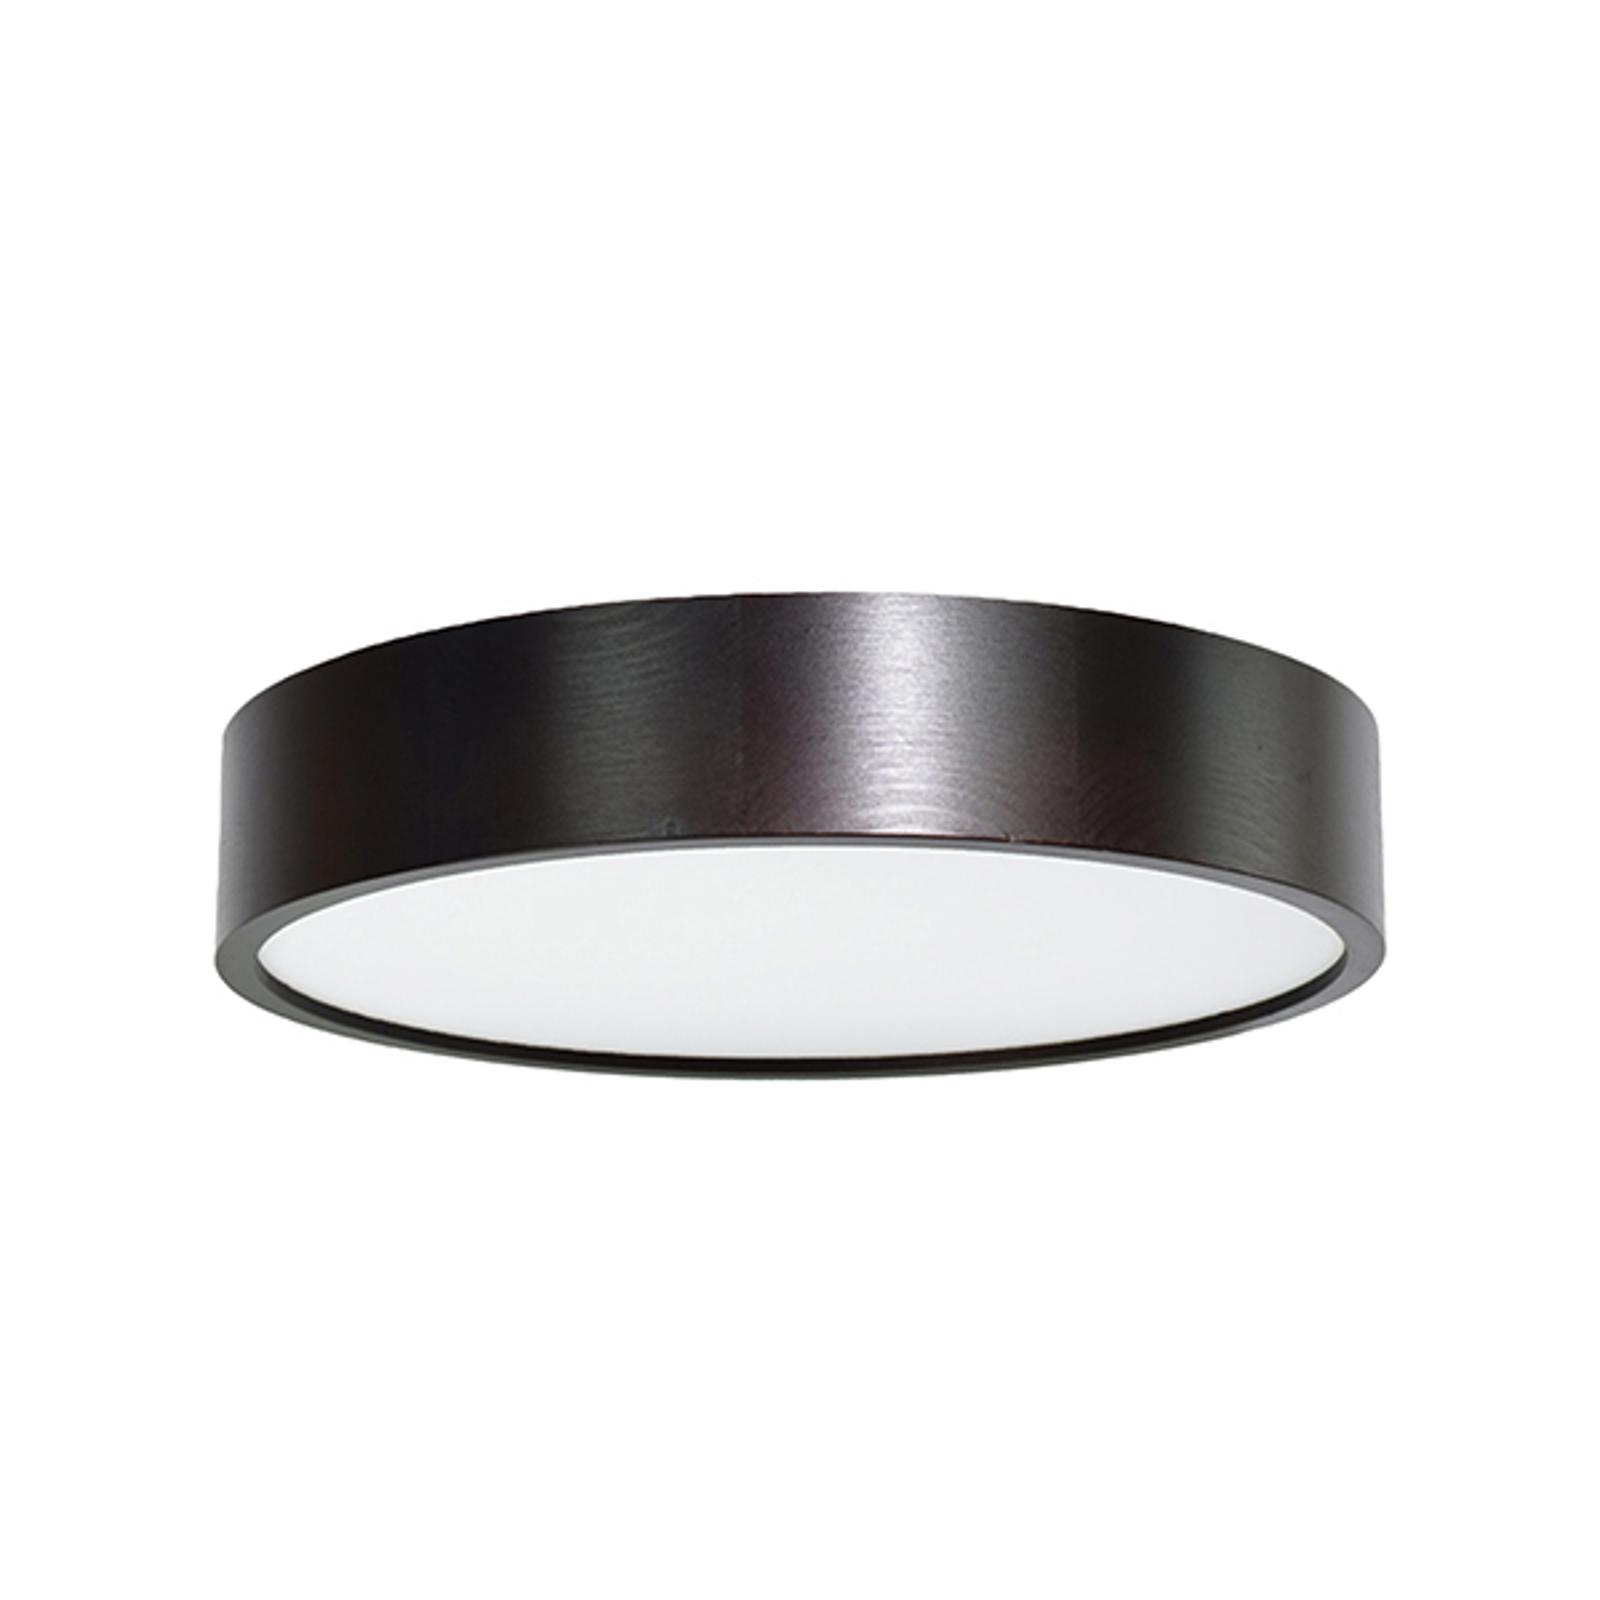 LED-kattovalaisin Cleo, Ø 38 cm, musta